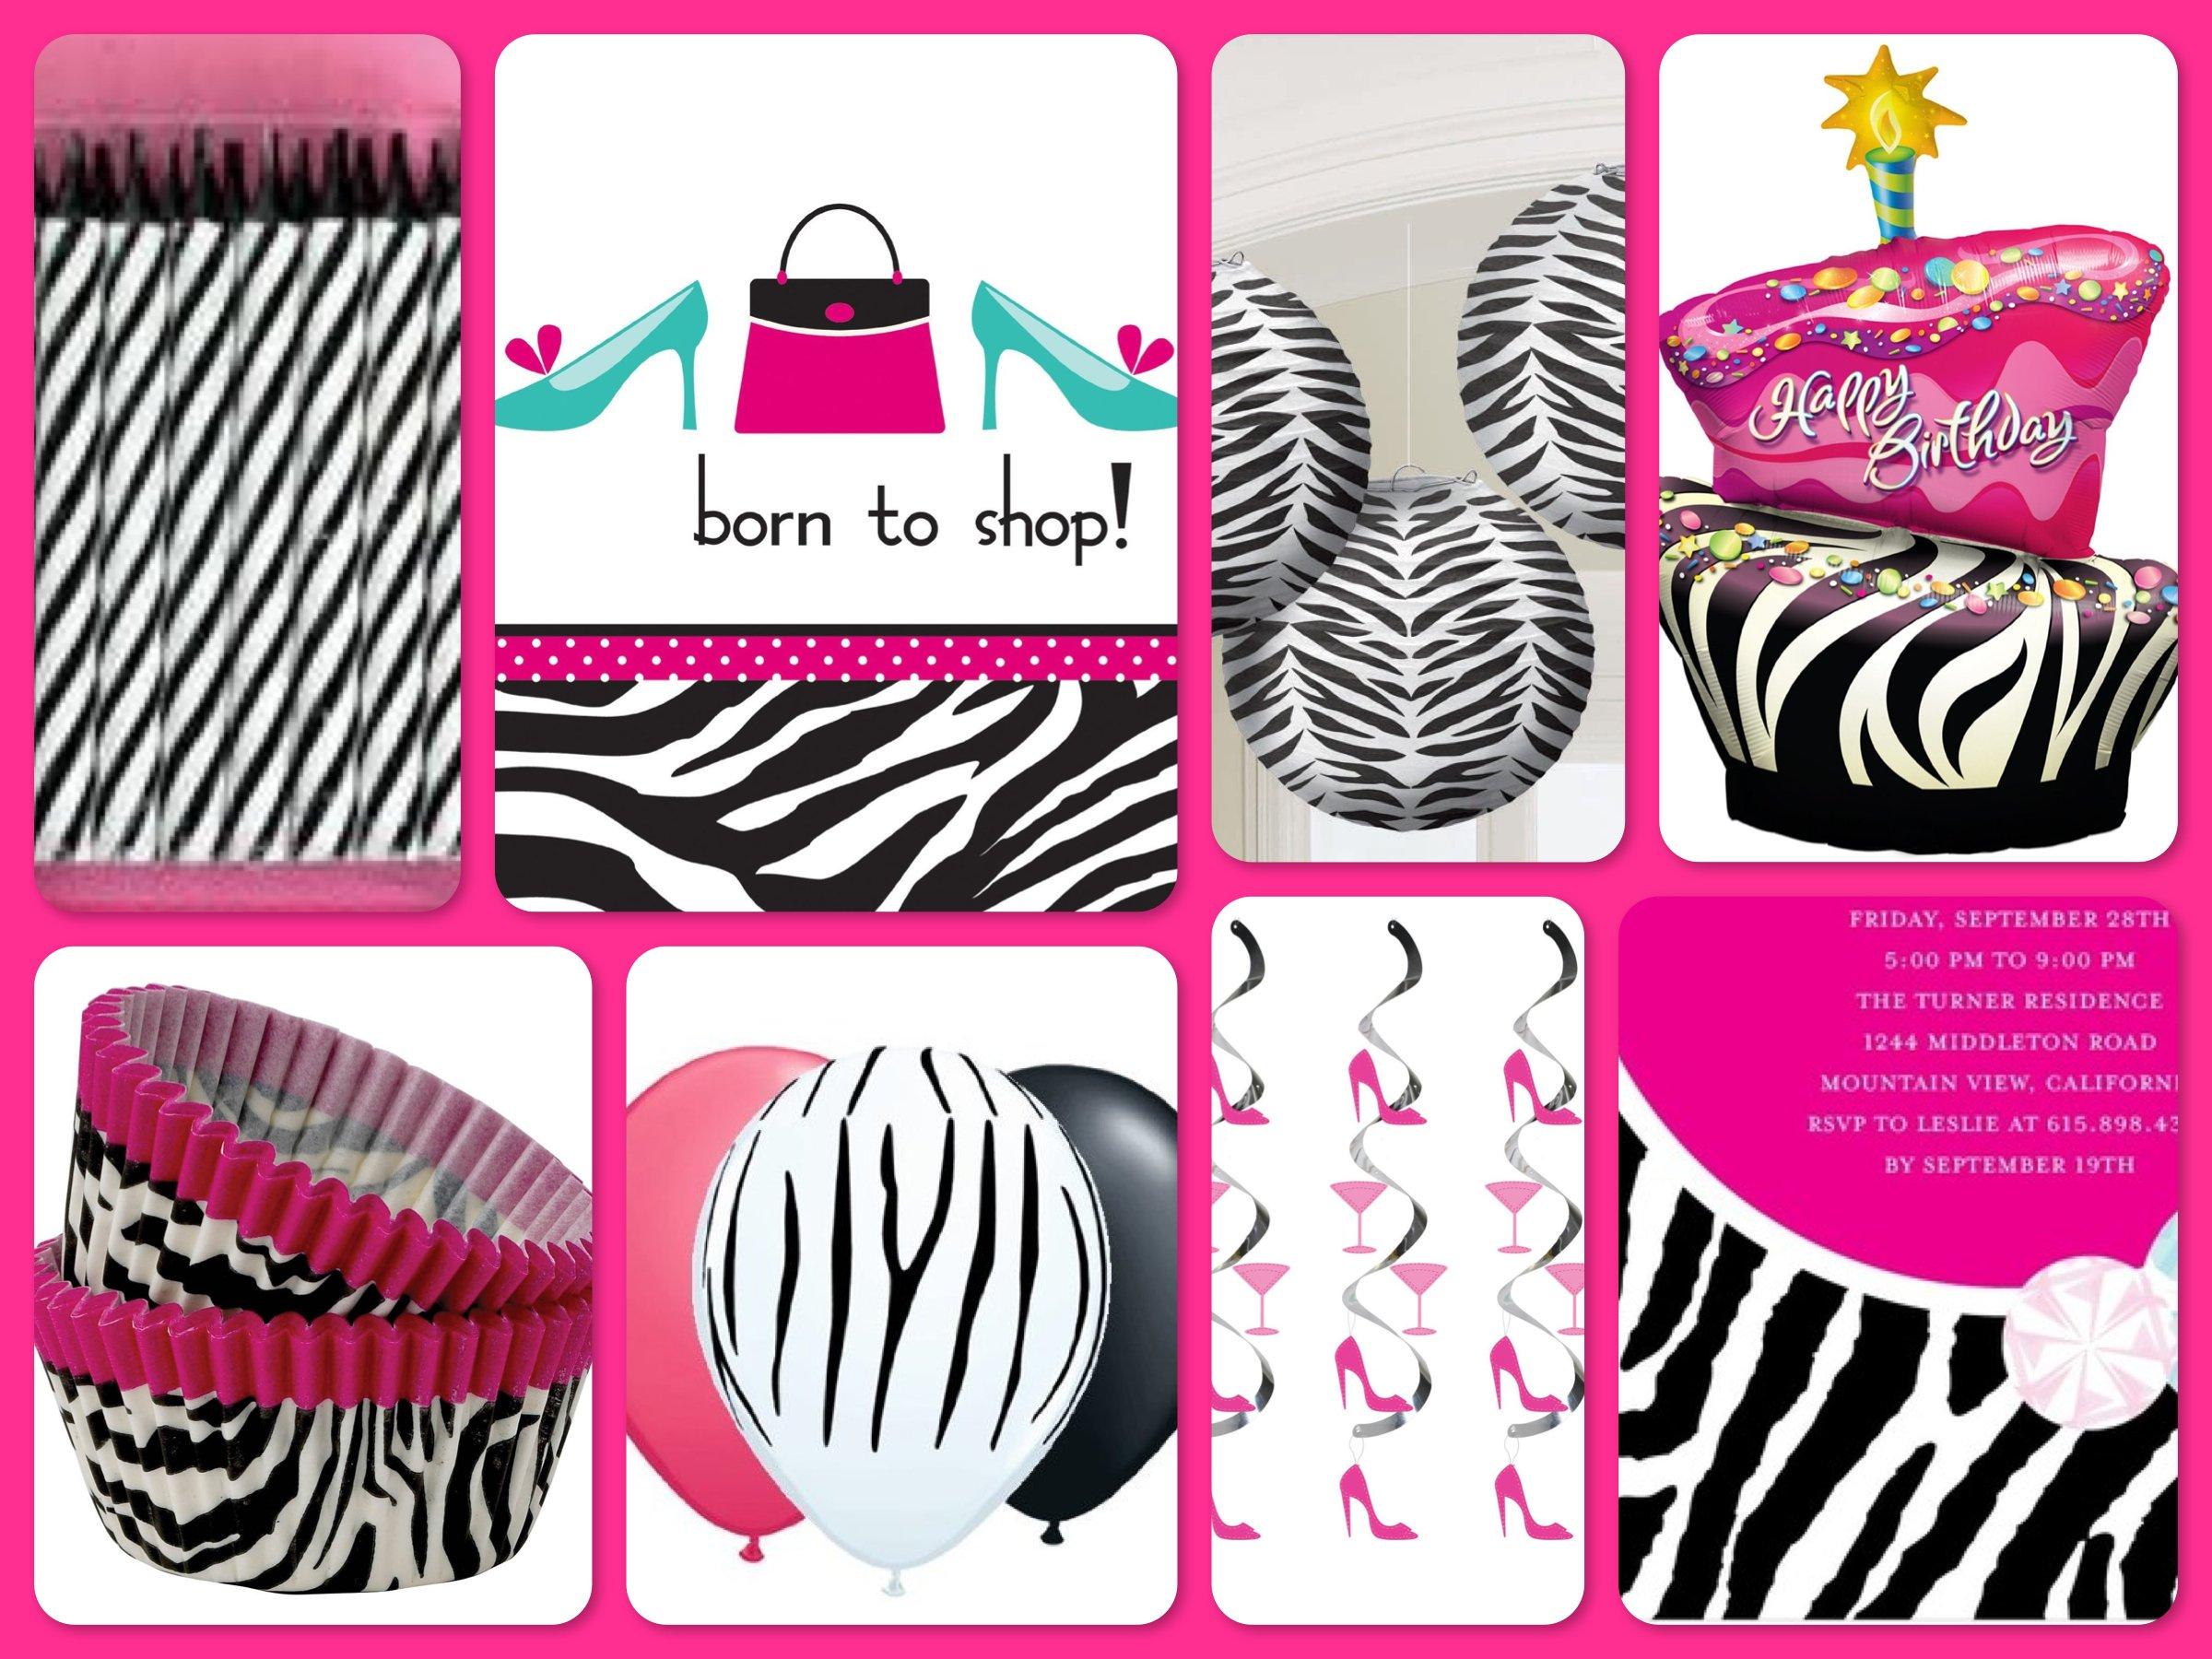 Born to Shop Pink Zebra Birthday Party